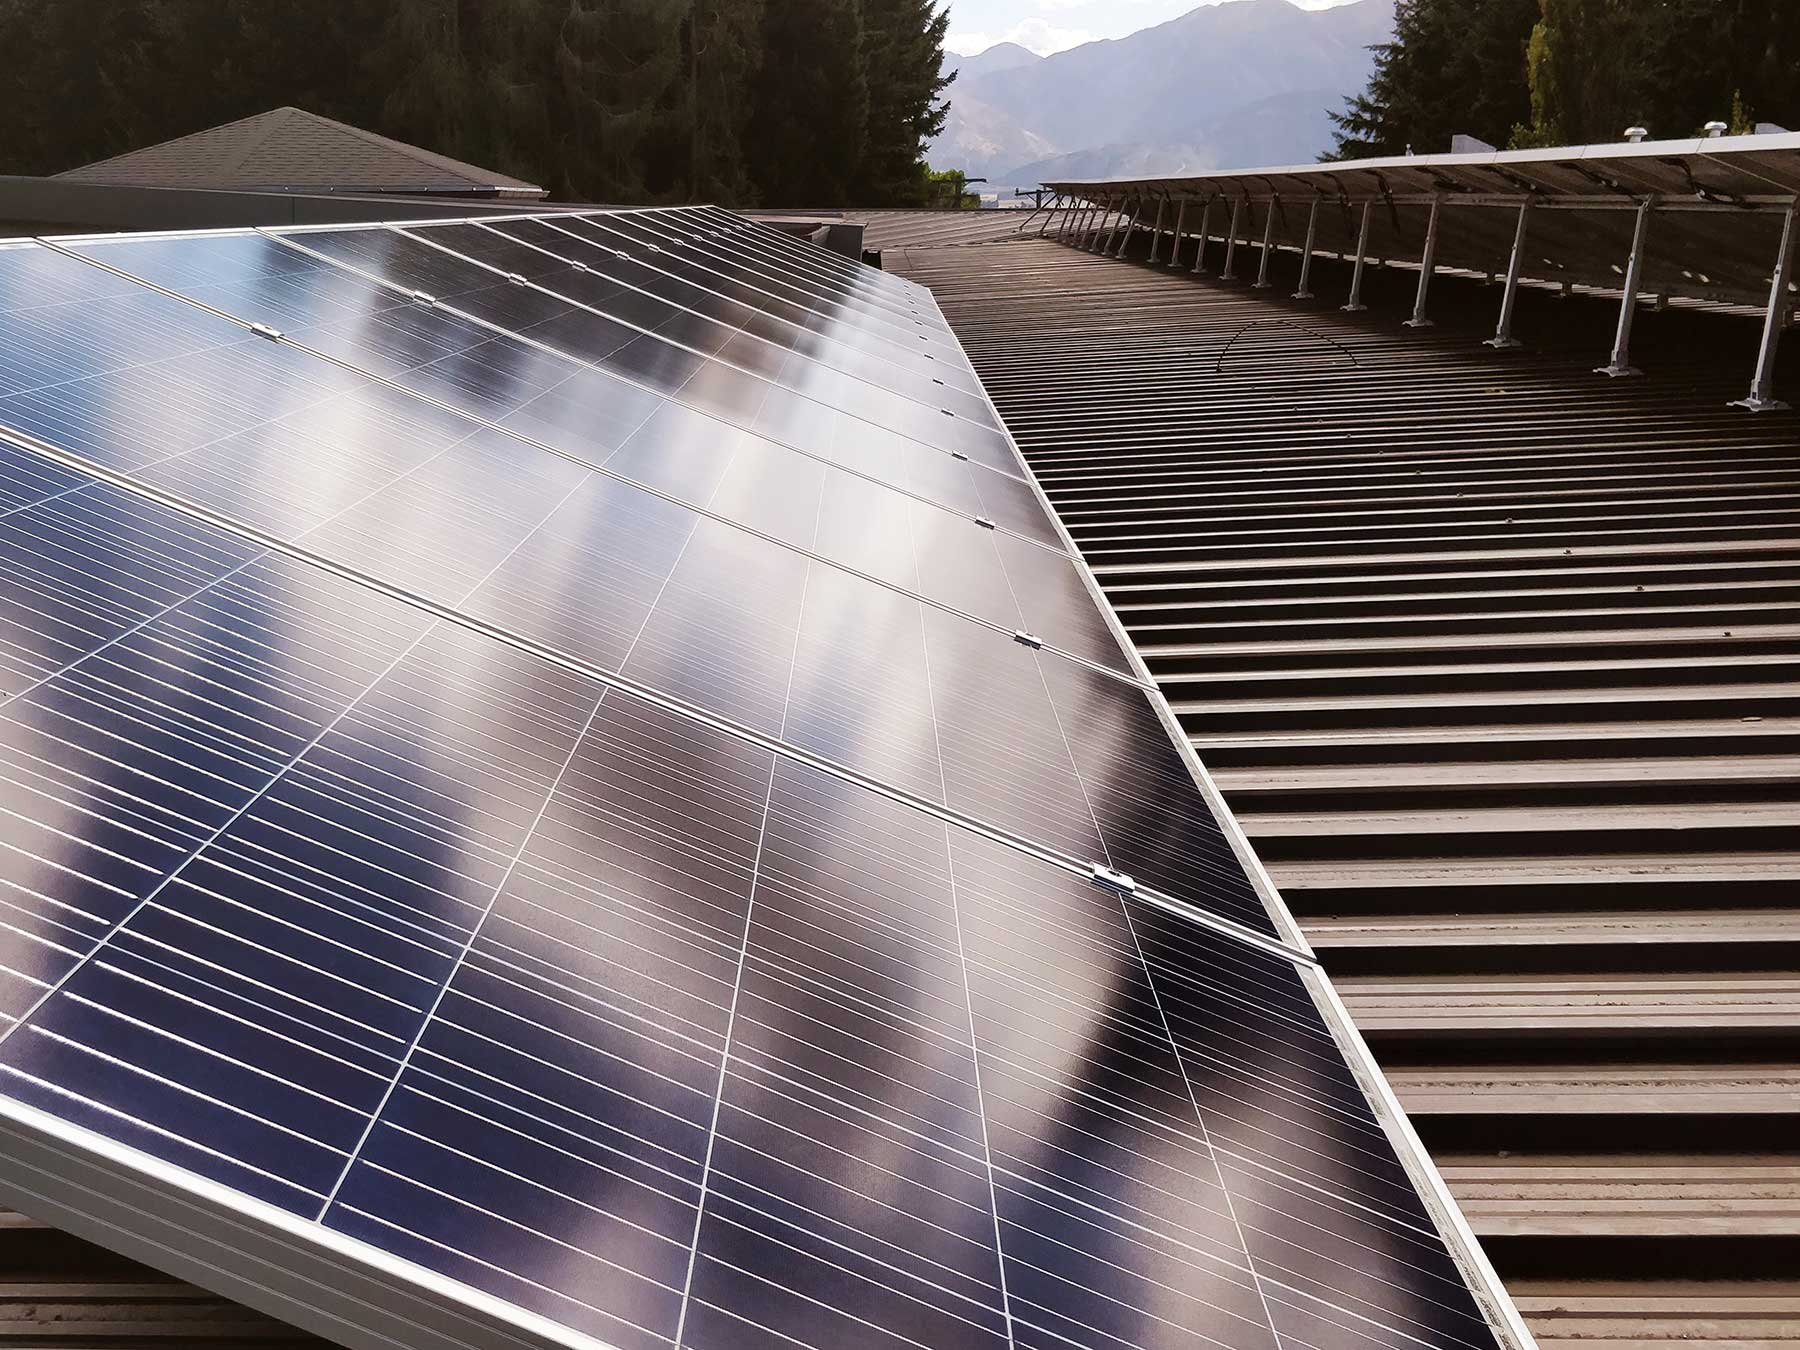 Braemar_Lodge-solar-panels-1800px